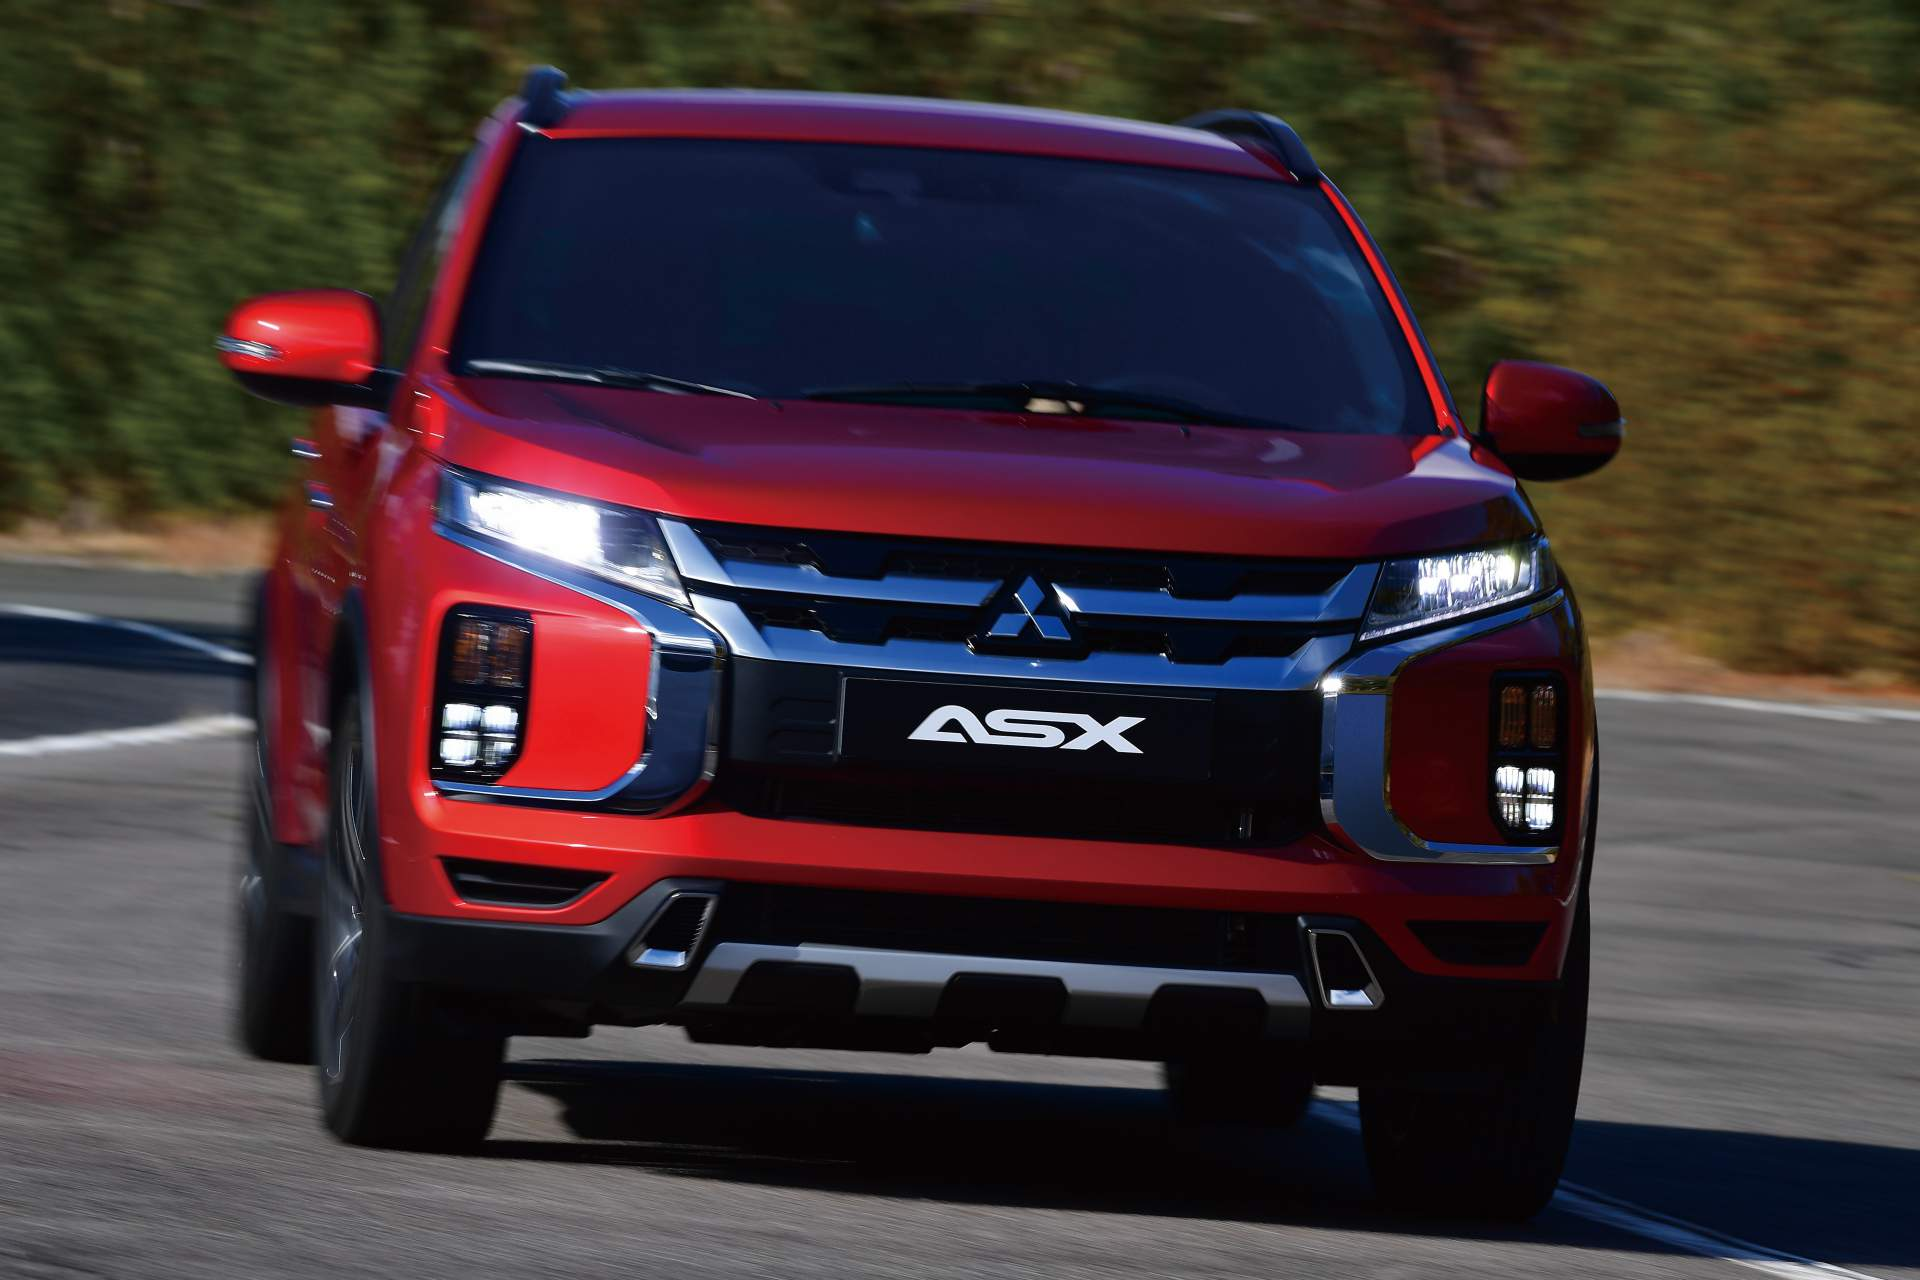 Mitsubishi ASX facelift 2019 (11)